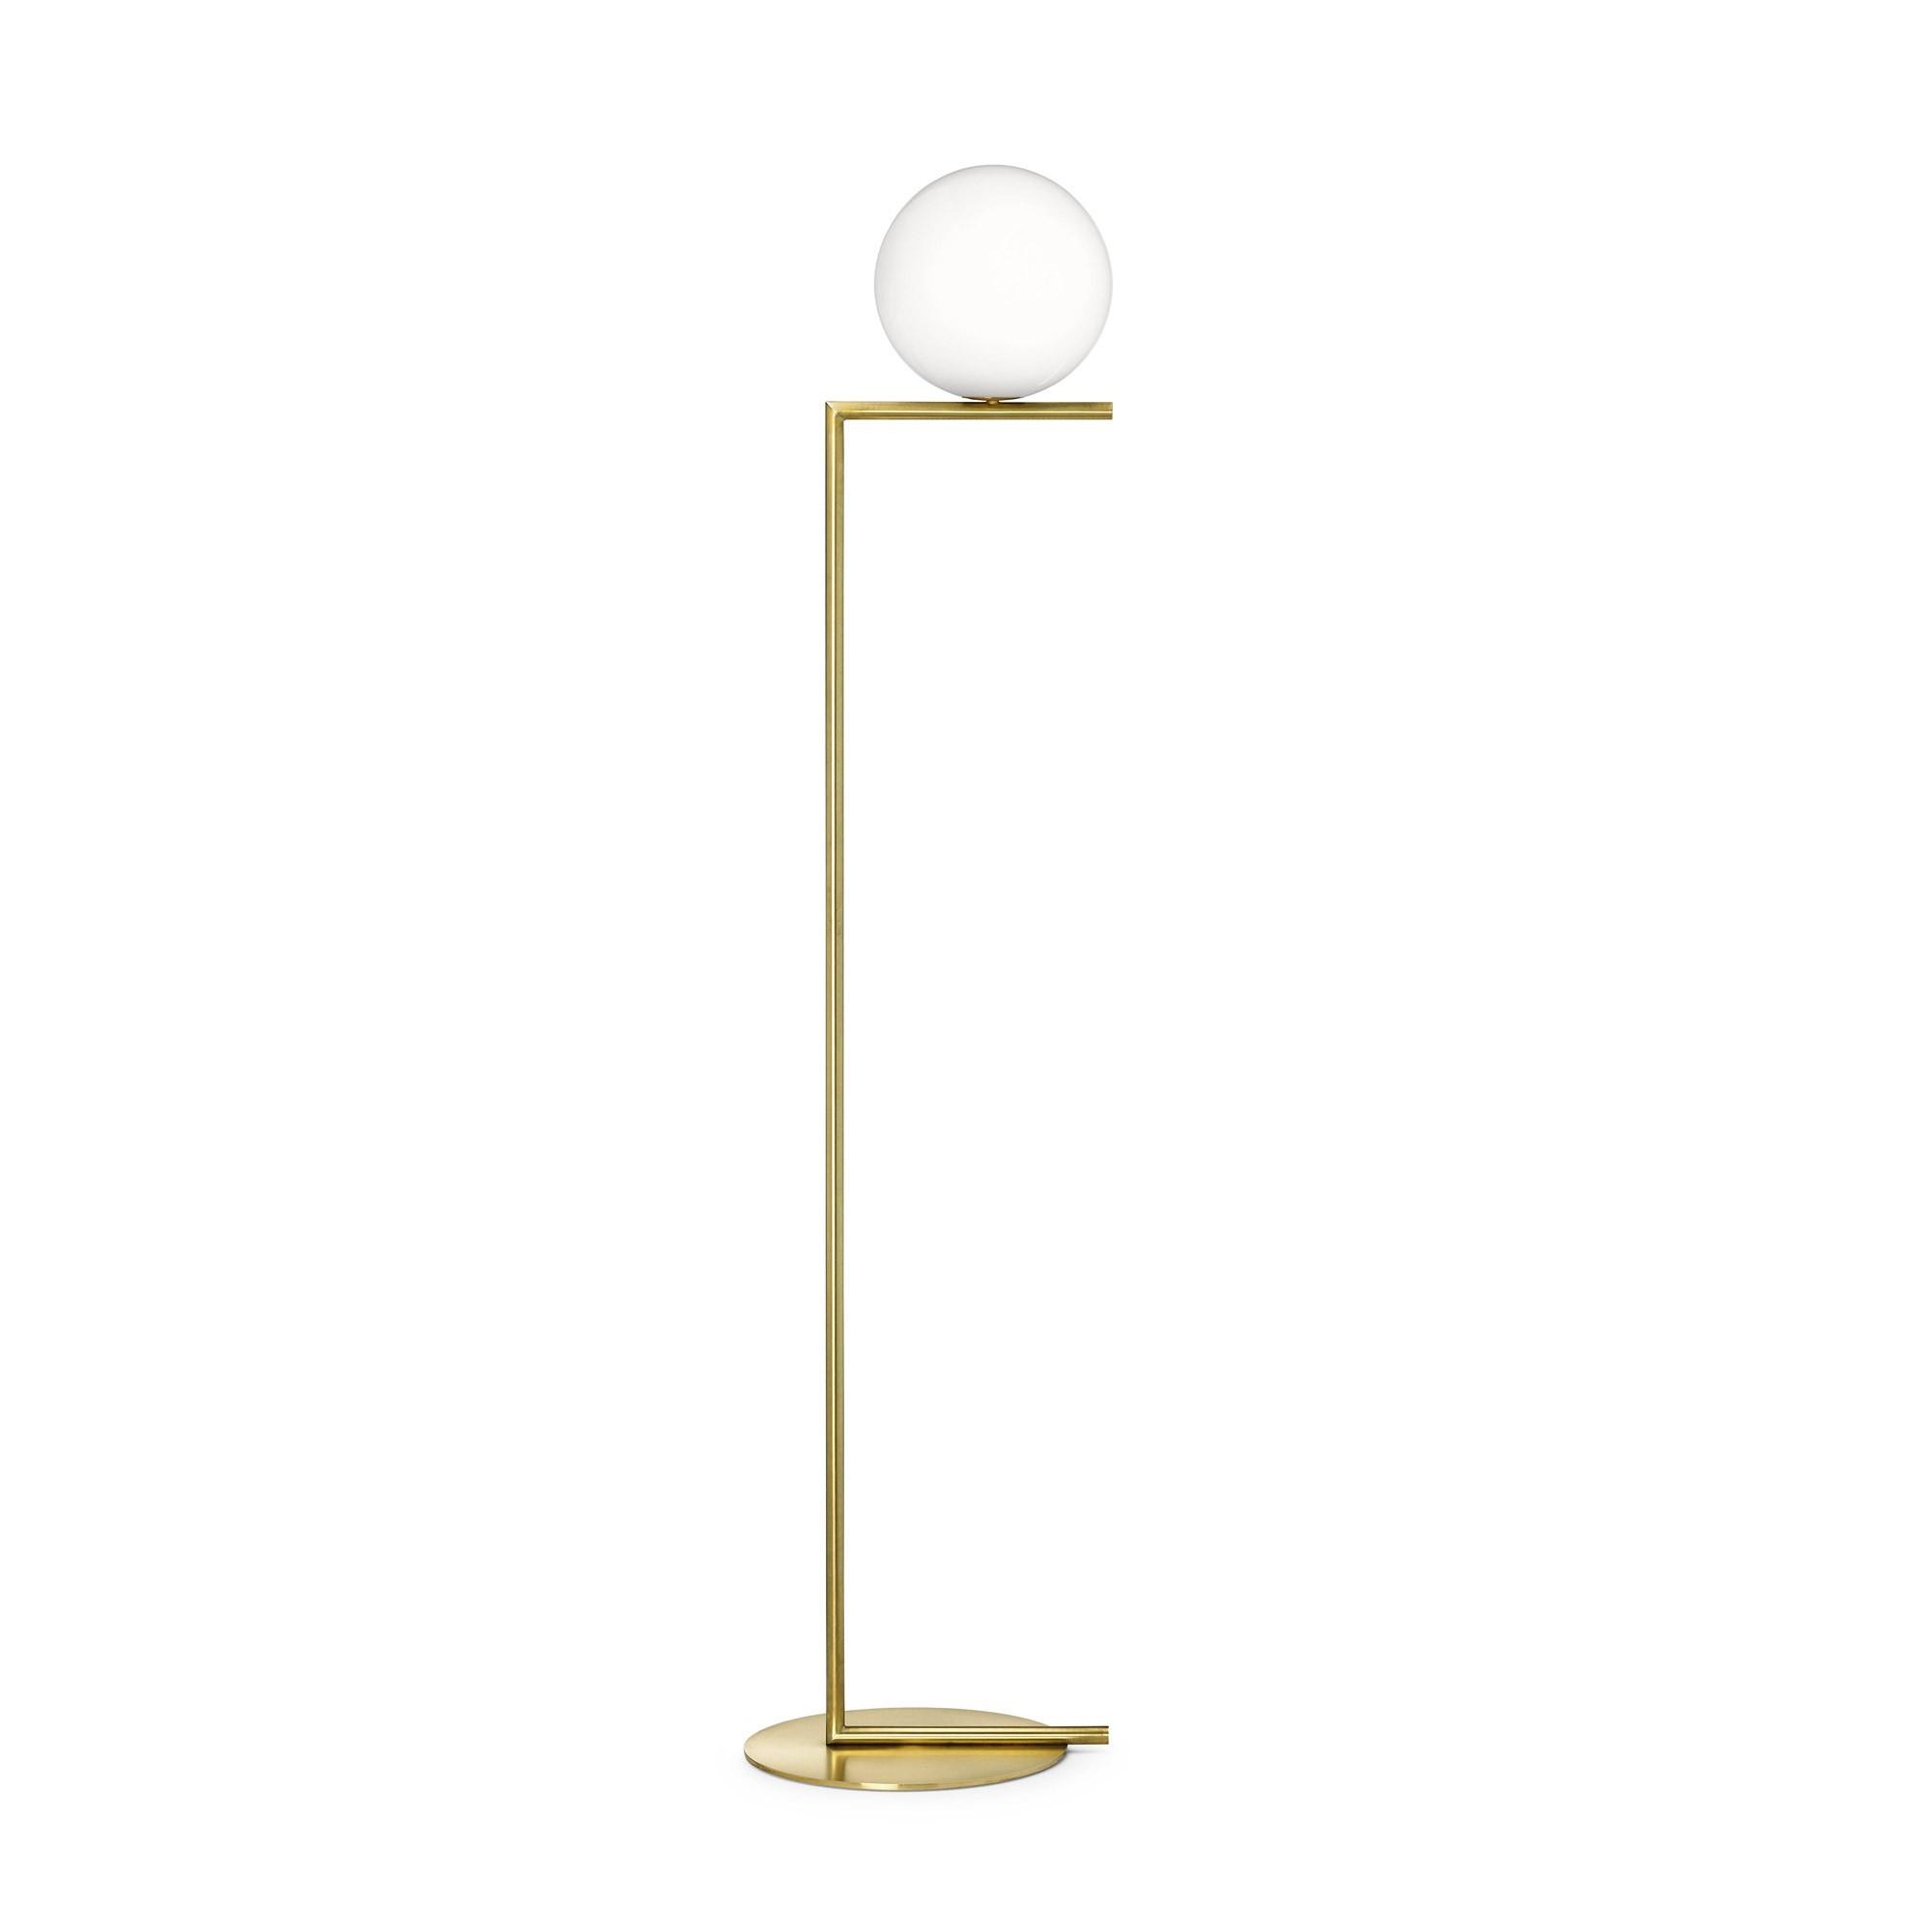 Flos IC F Floor Lamp | Deplain.com